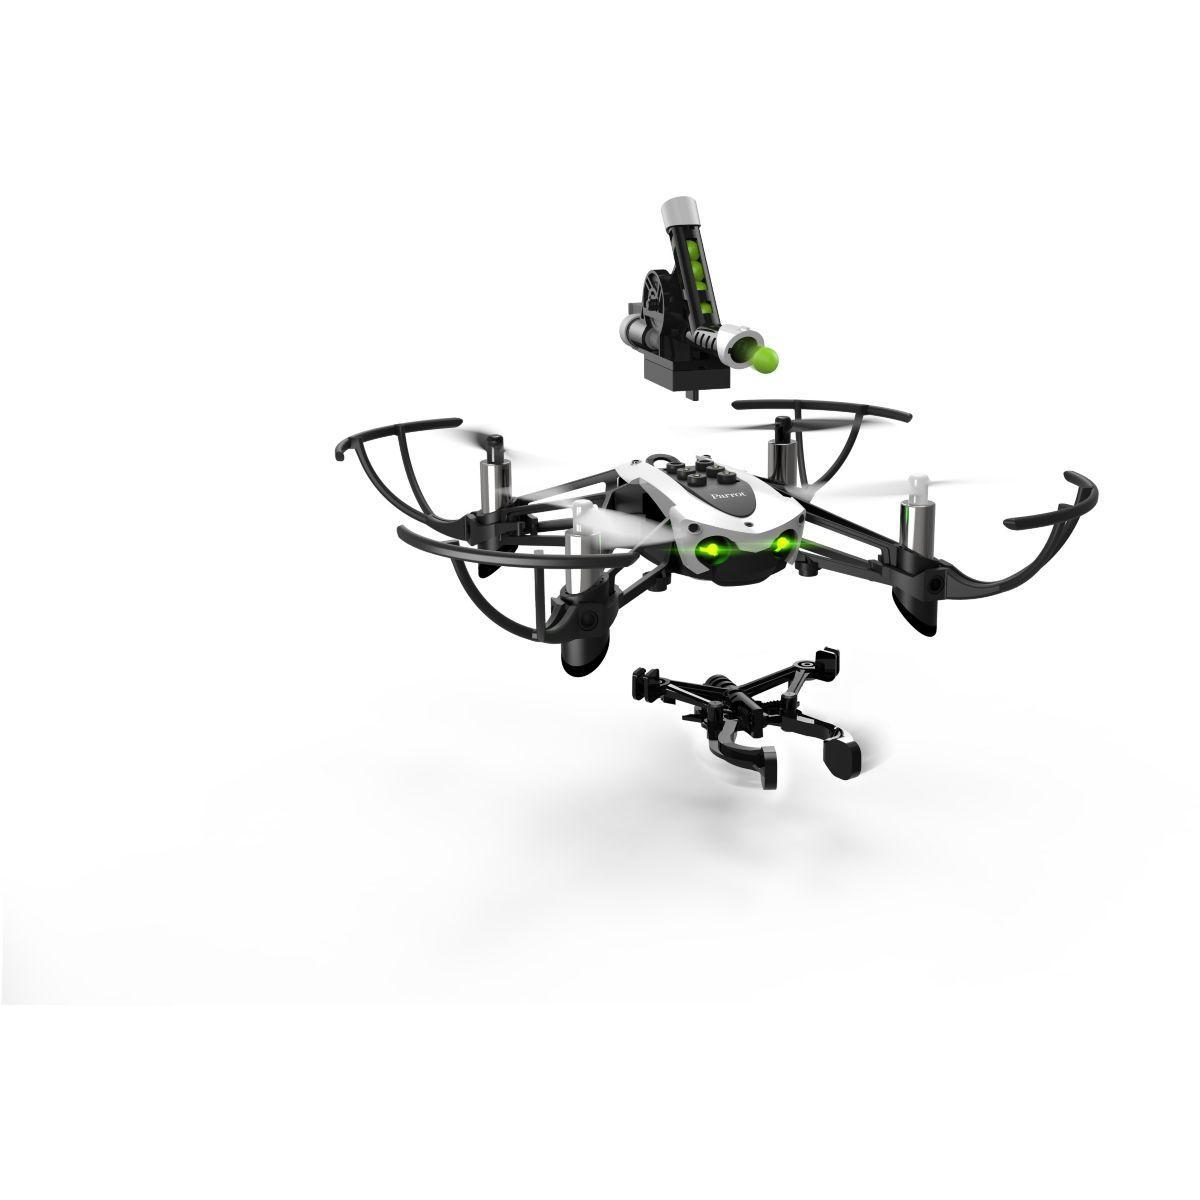 Drones parrot mambo - livraison offerte avec le code livofferte (photo)